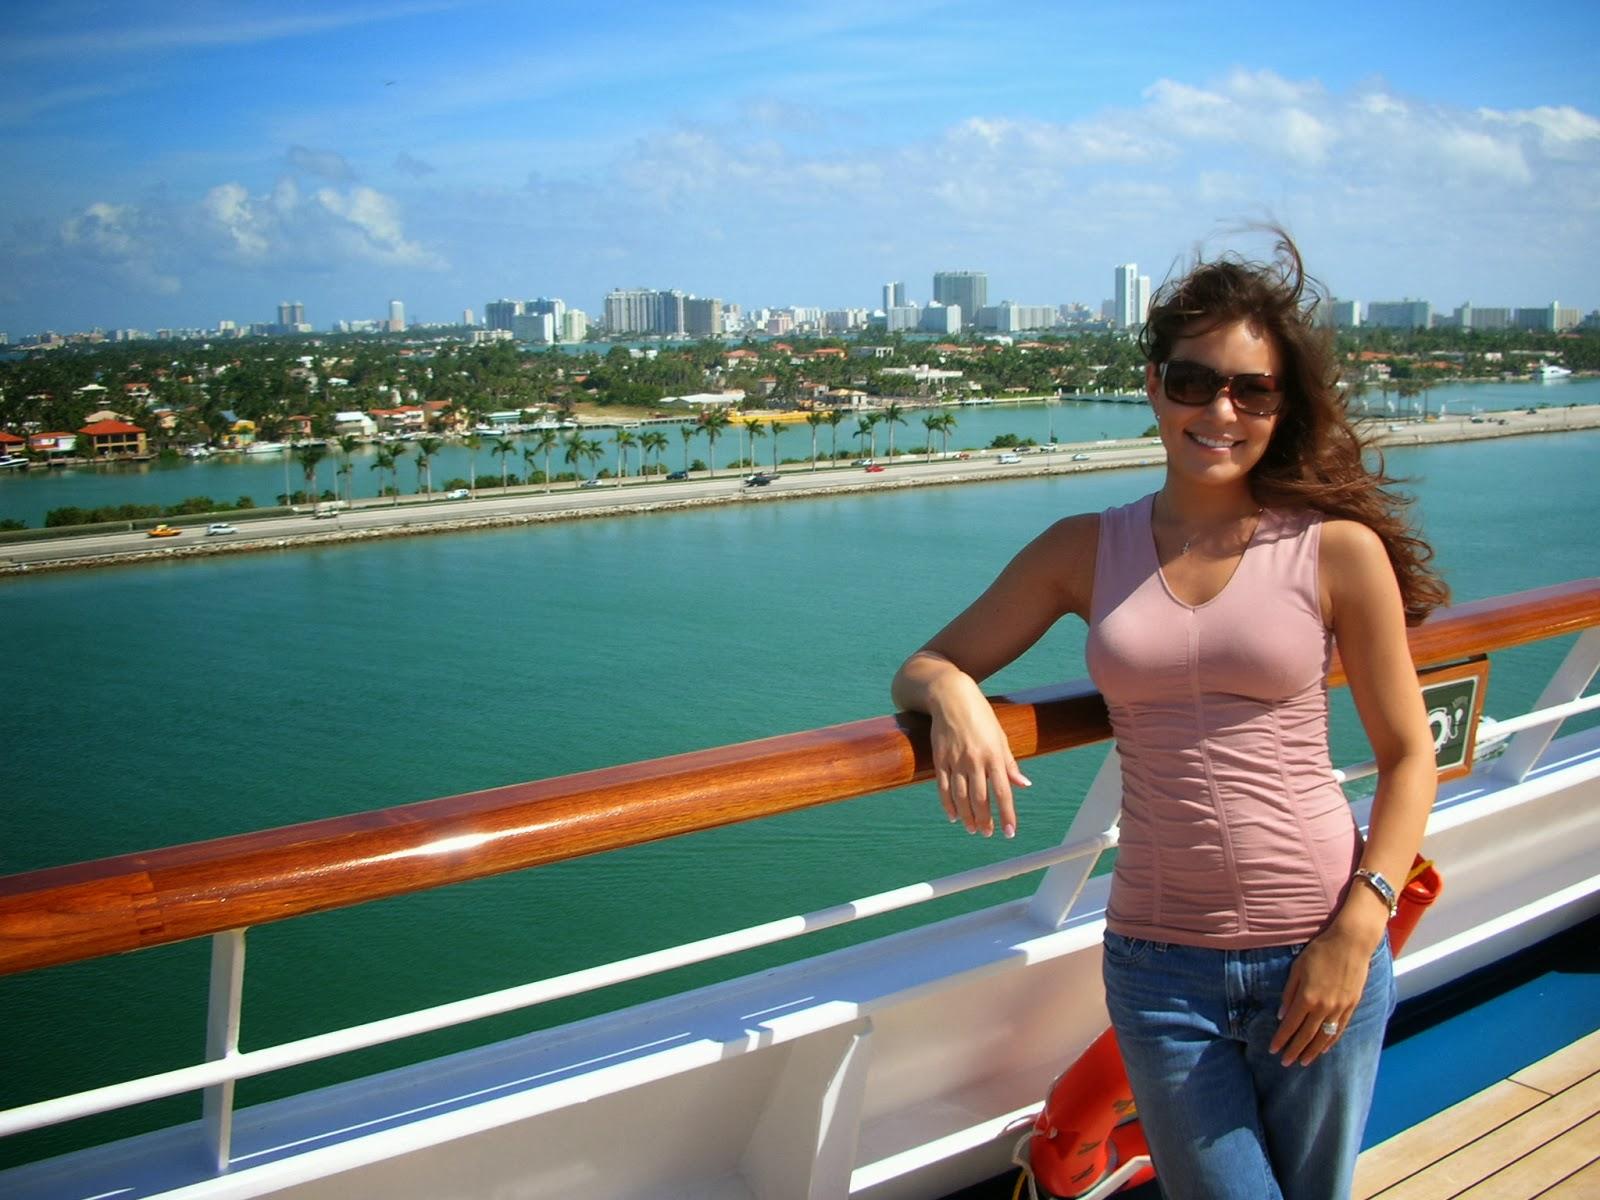 Our Honeymoon Cruise